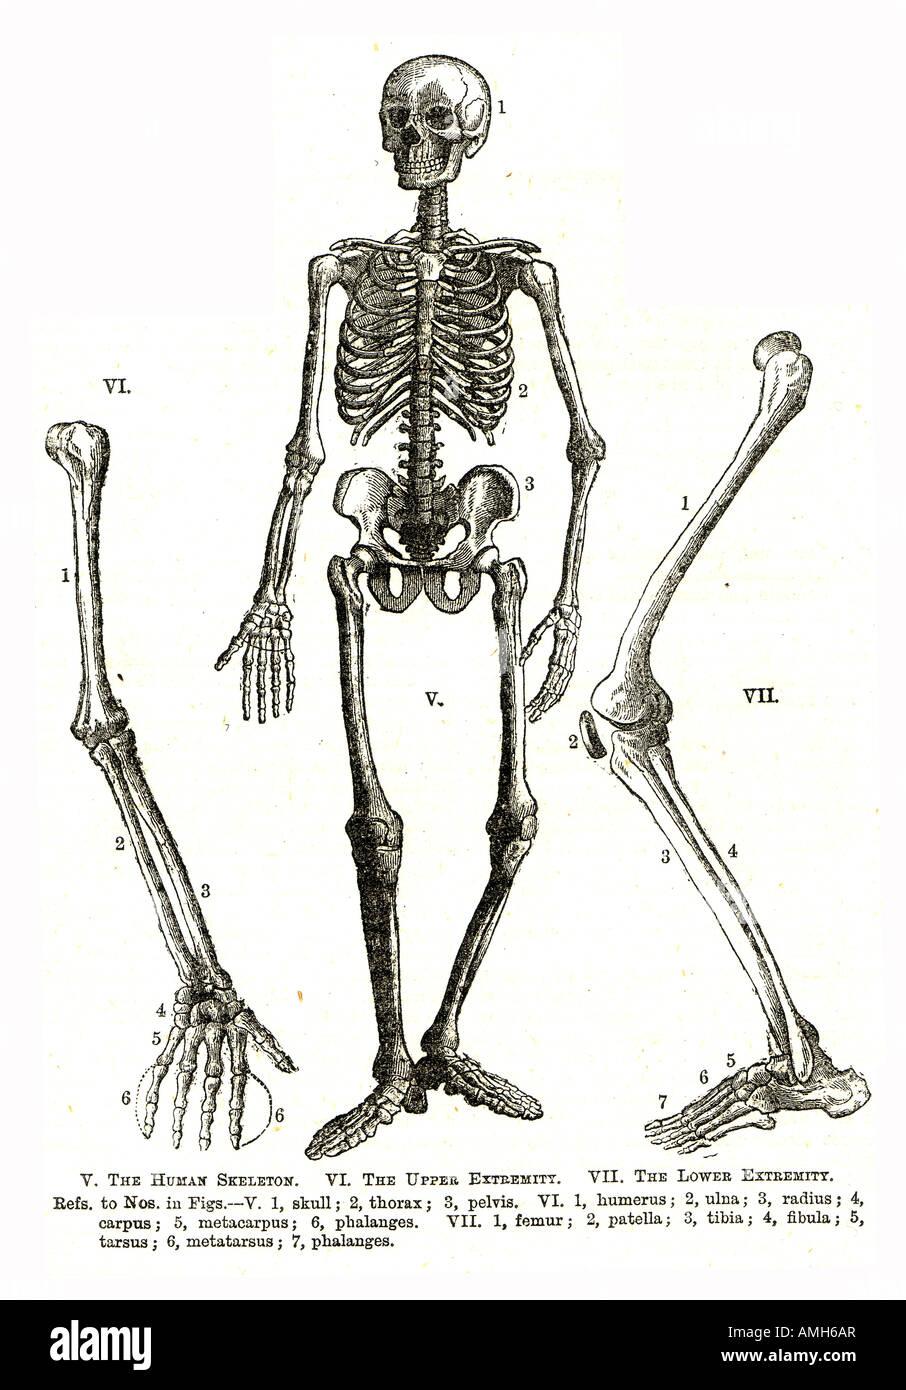 Skeleton human anatomy upper lower extremity skull thorax pelvis ...